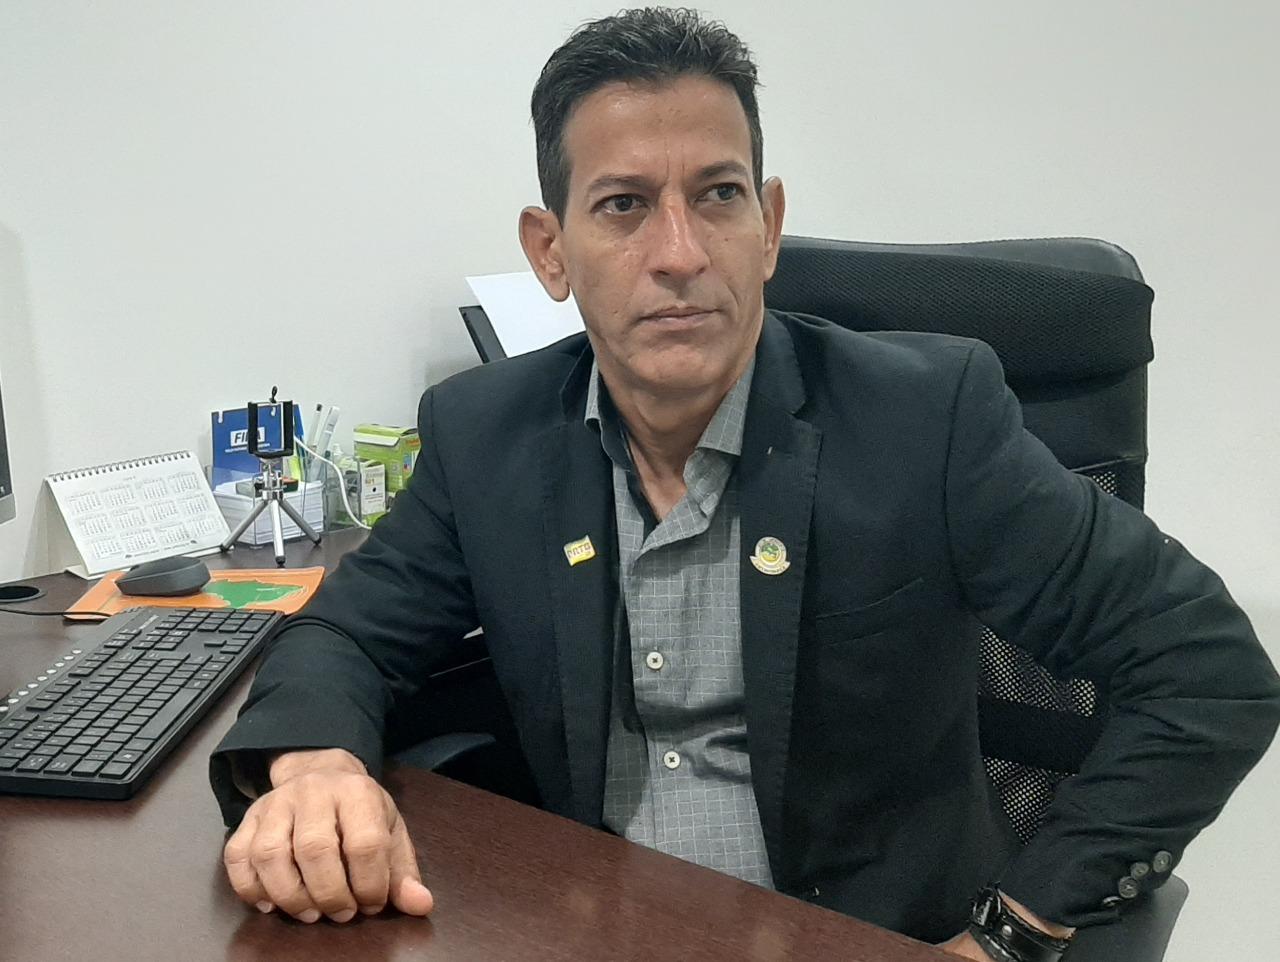 Wellington Sena registrou boletim de ocorrência